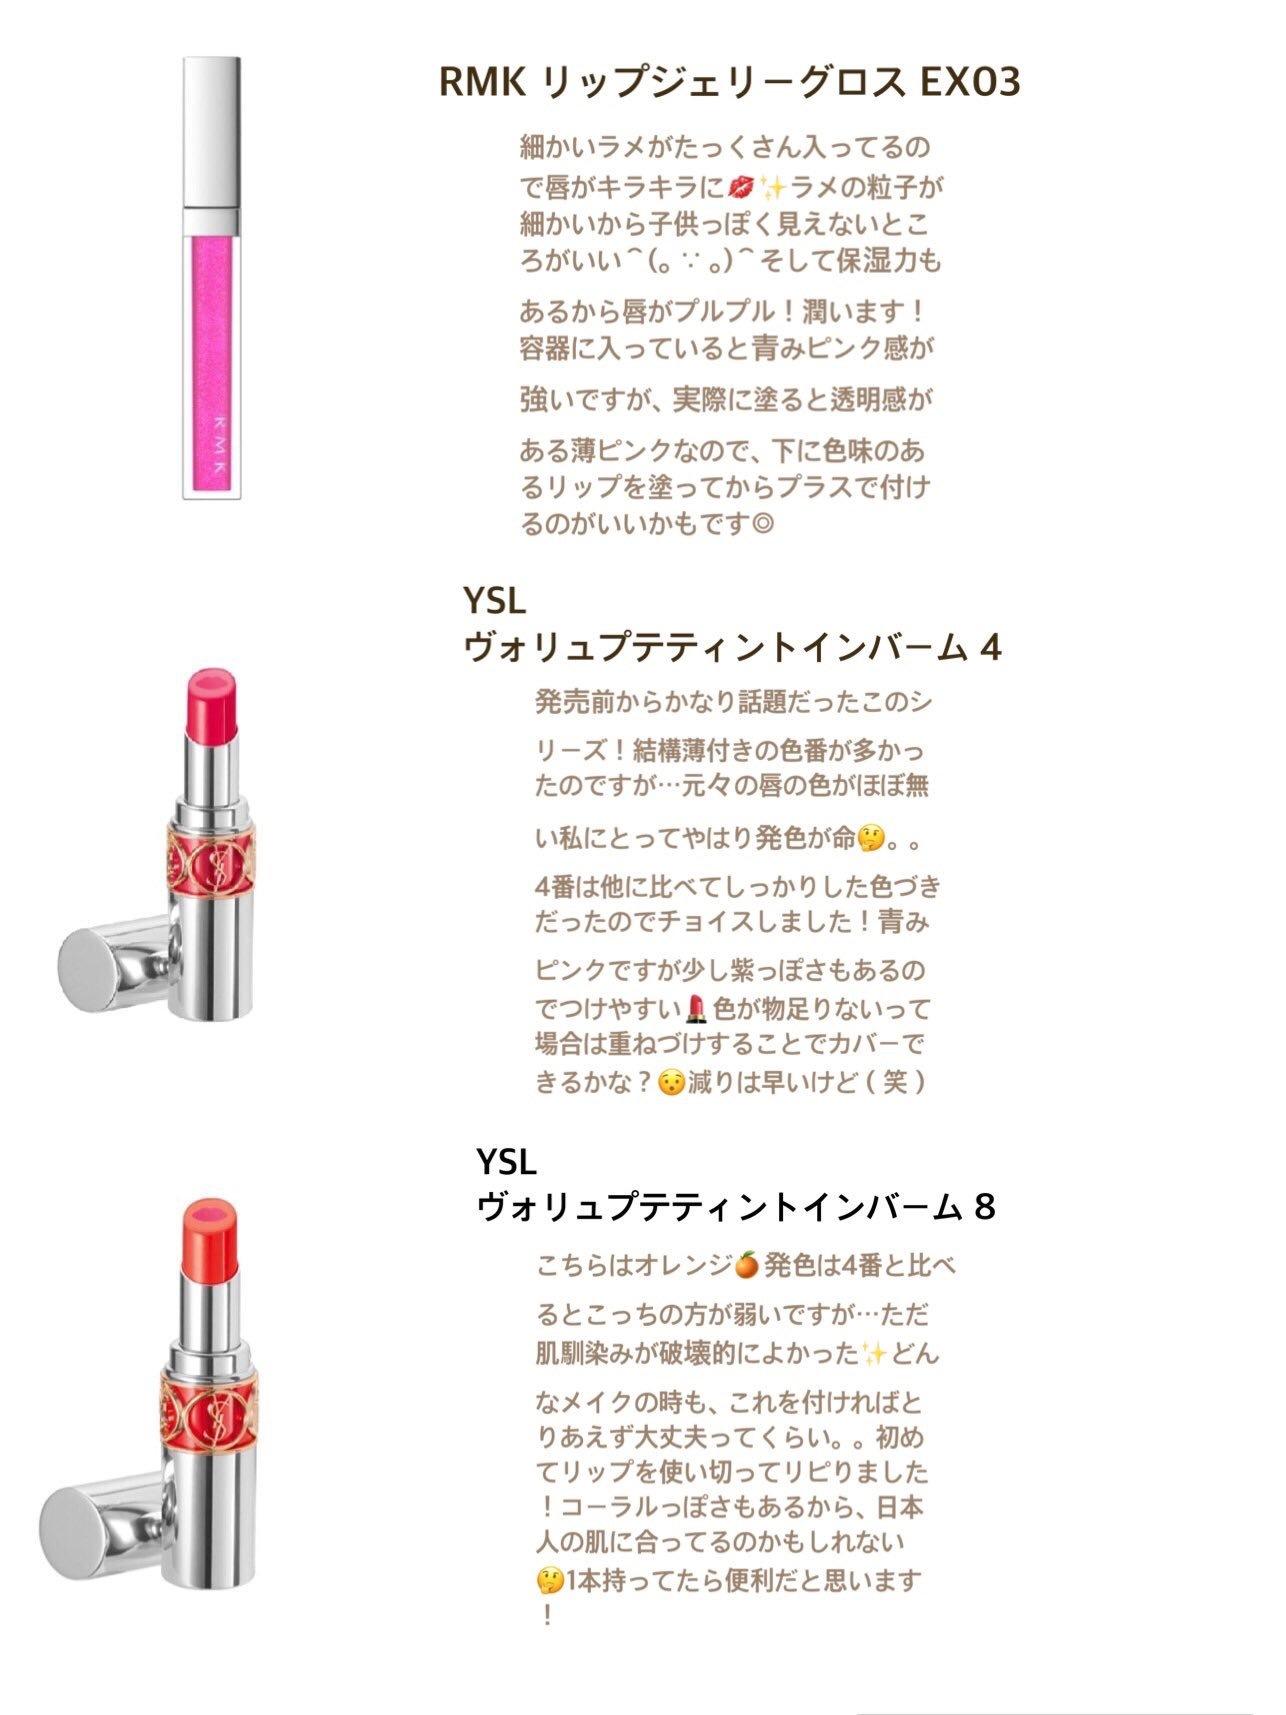 ^o^第48回【2017年!】私的ベストコスメ〜リップ編〜_1_3